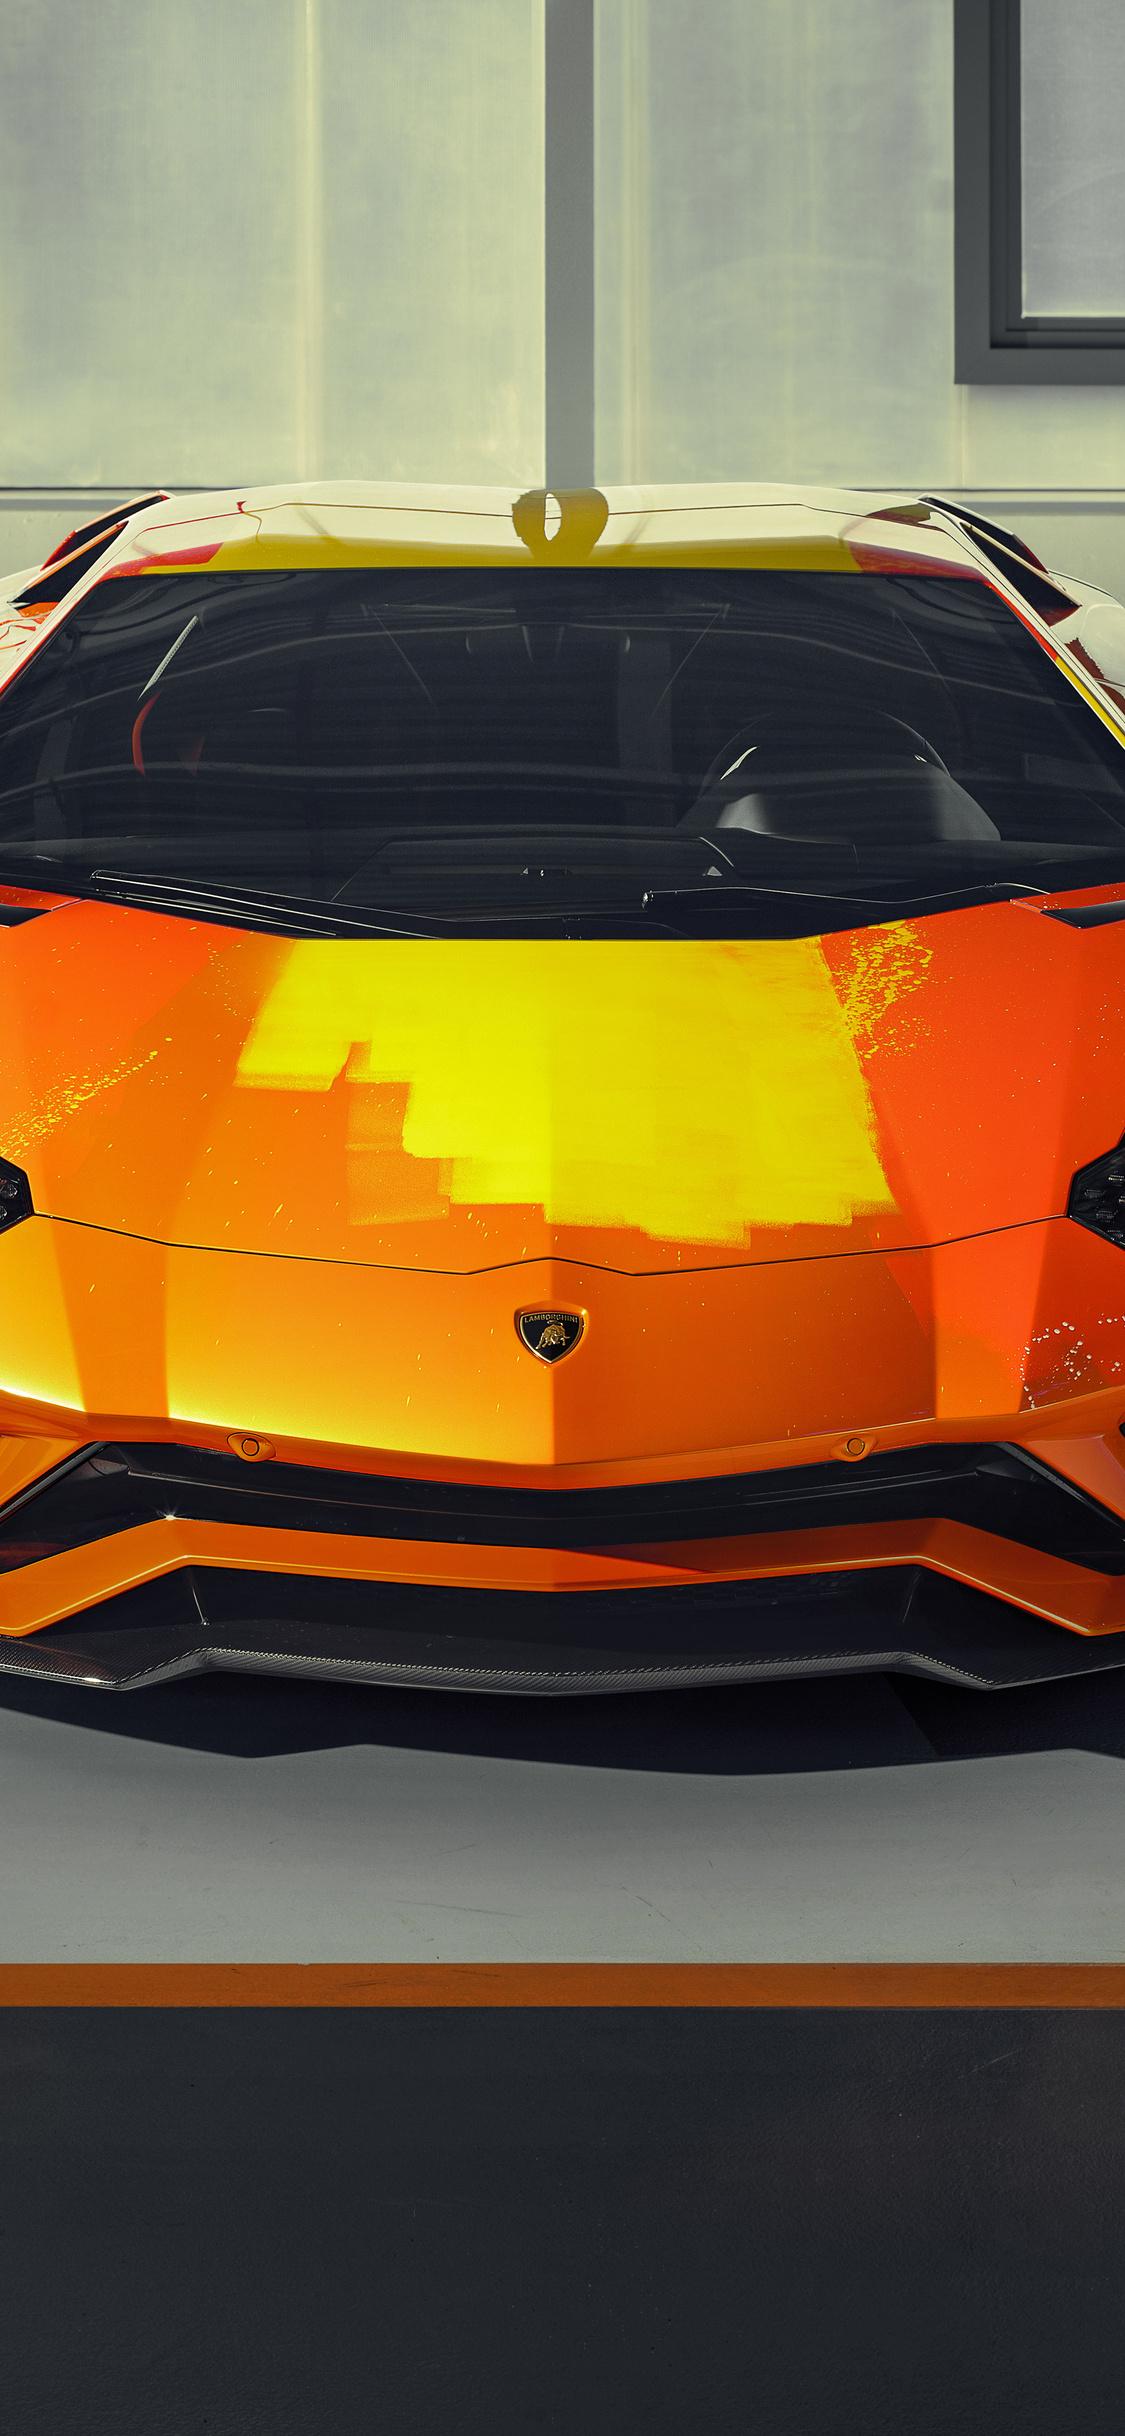 1125x2436 2019 Lamborghini Aventador S Front View Iphone Xs